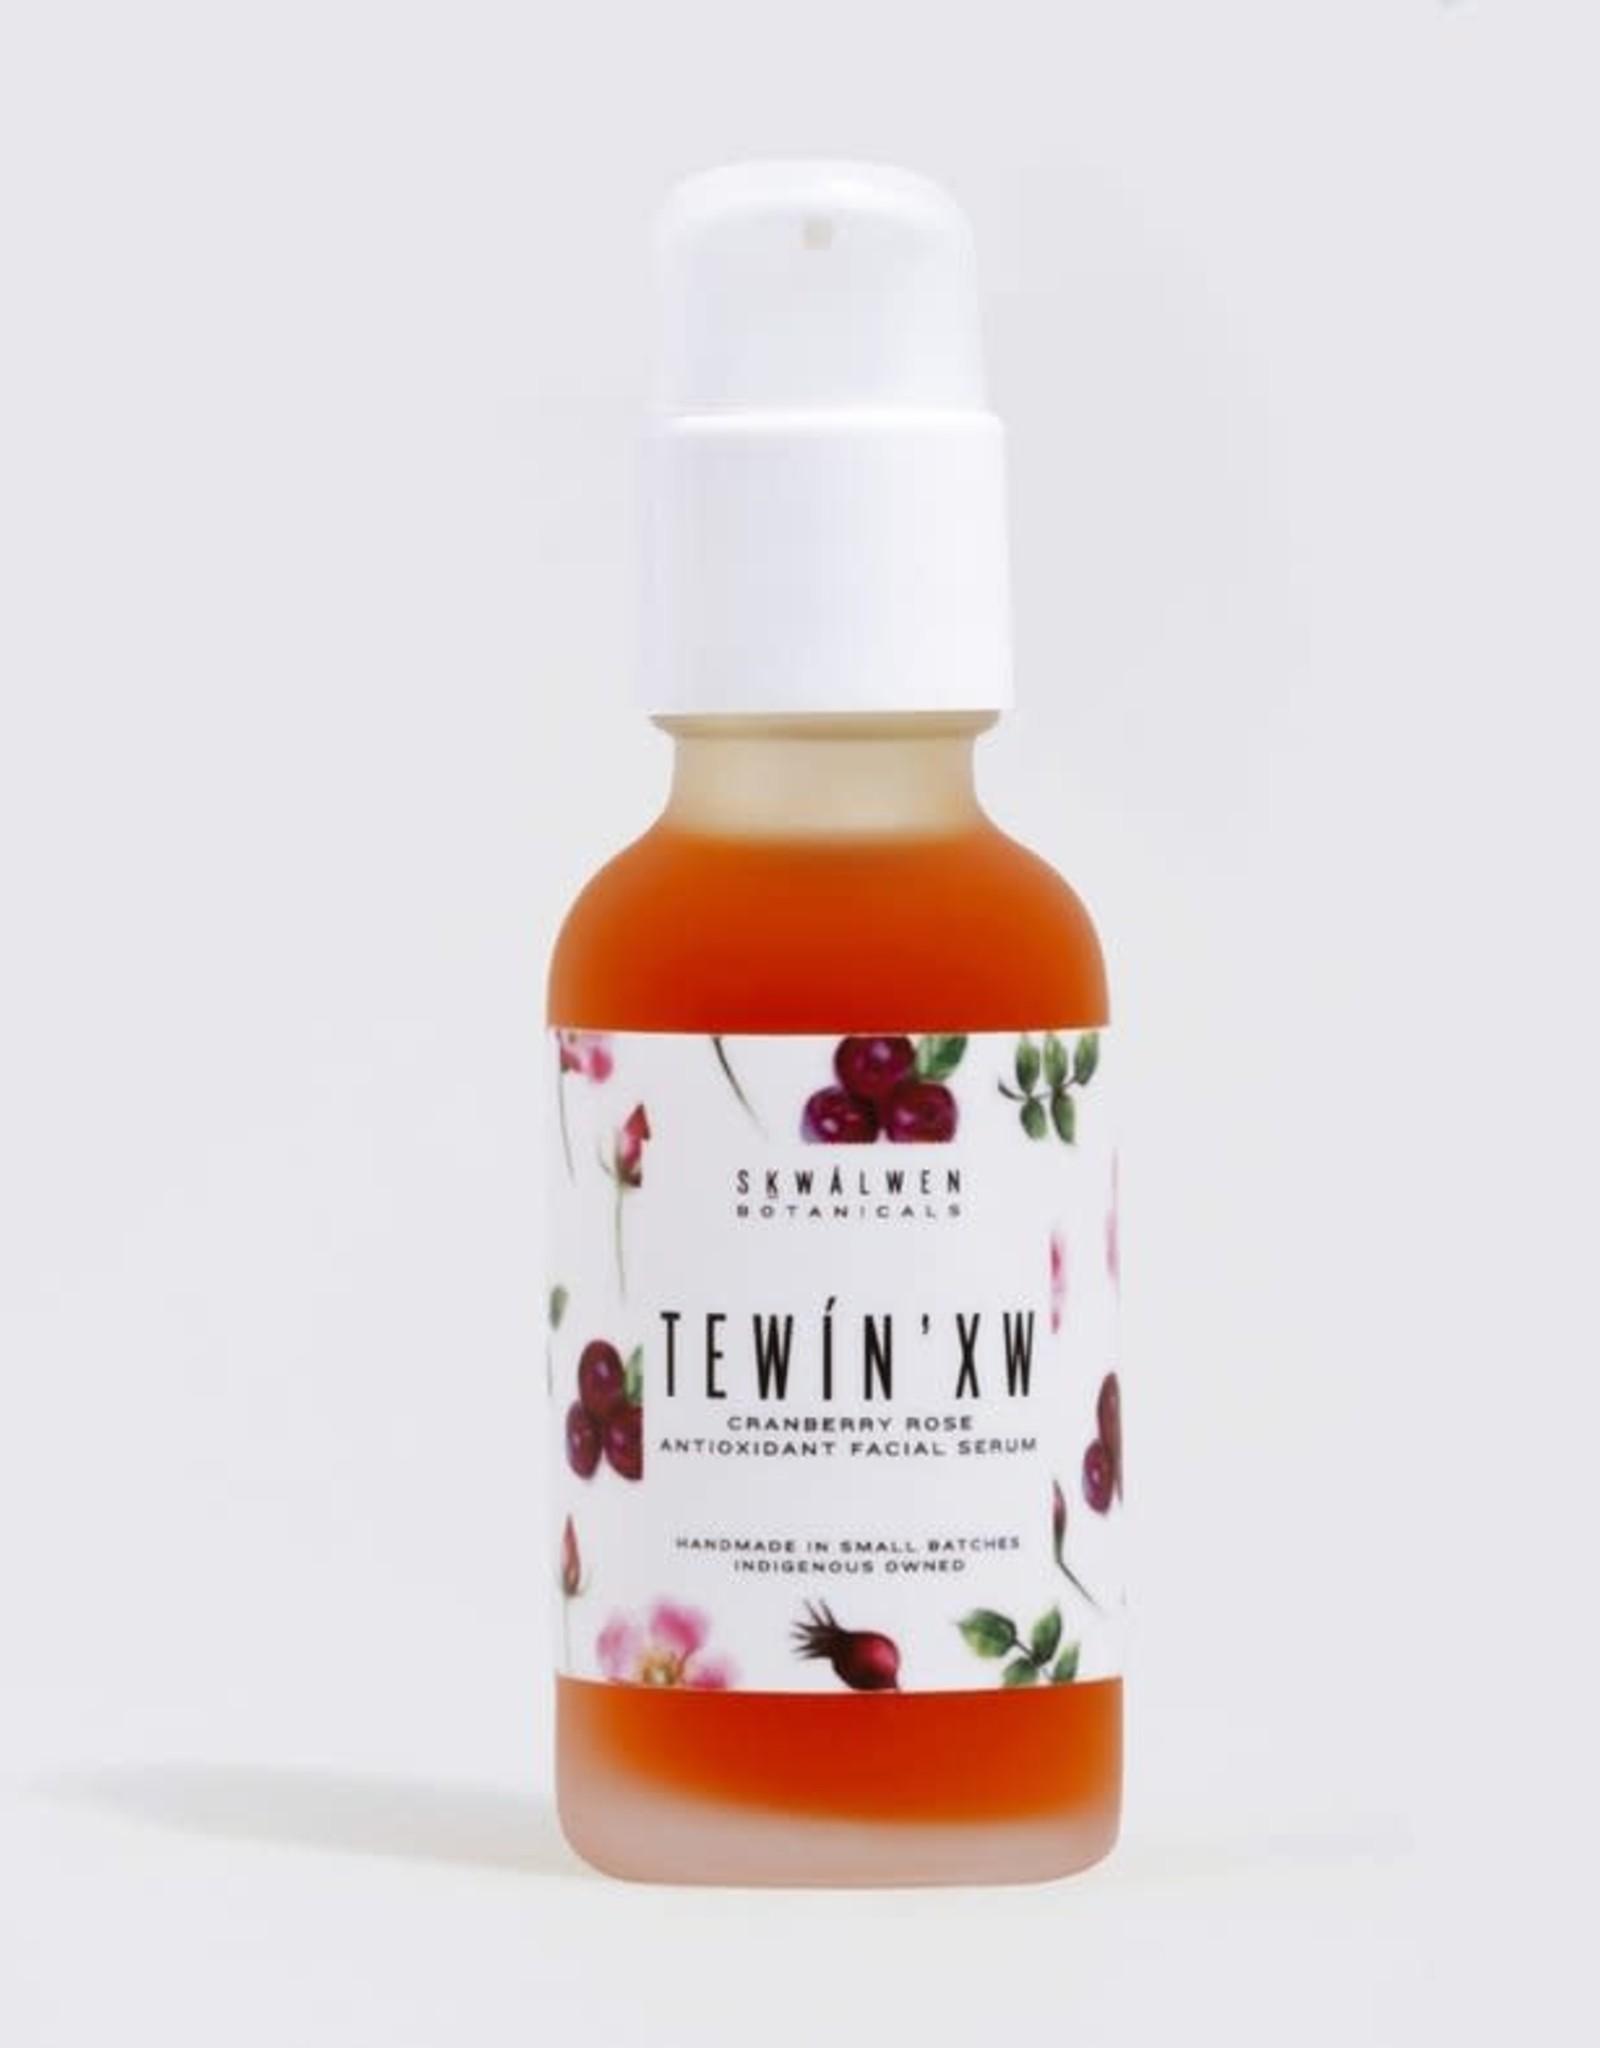 Skwalwen Botanicals Skwalwen Botanicals - Cranberry Rose Facial Serum